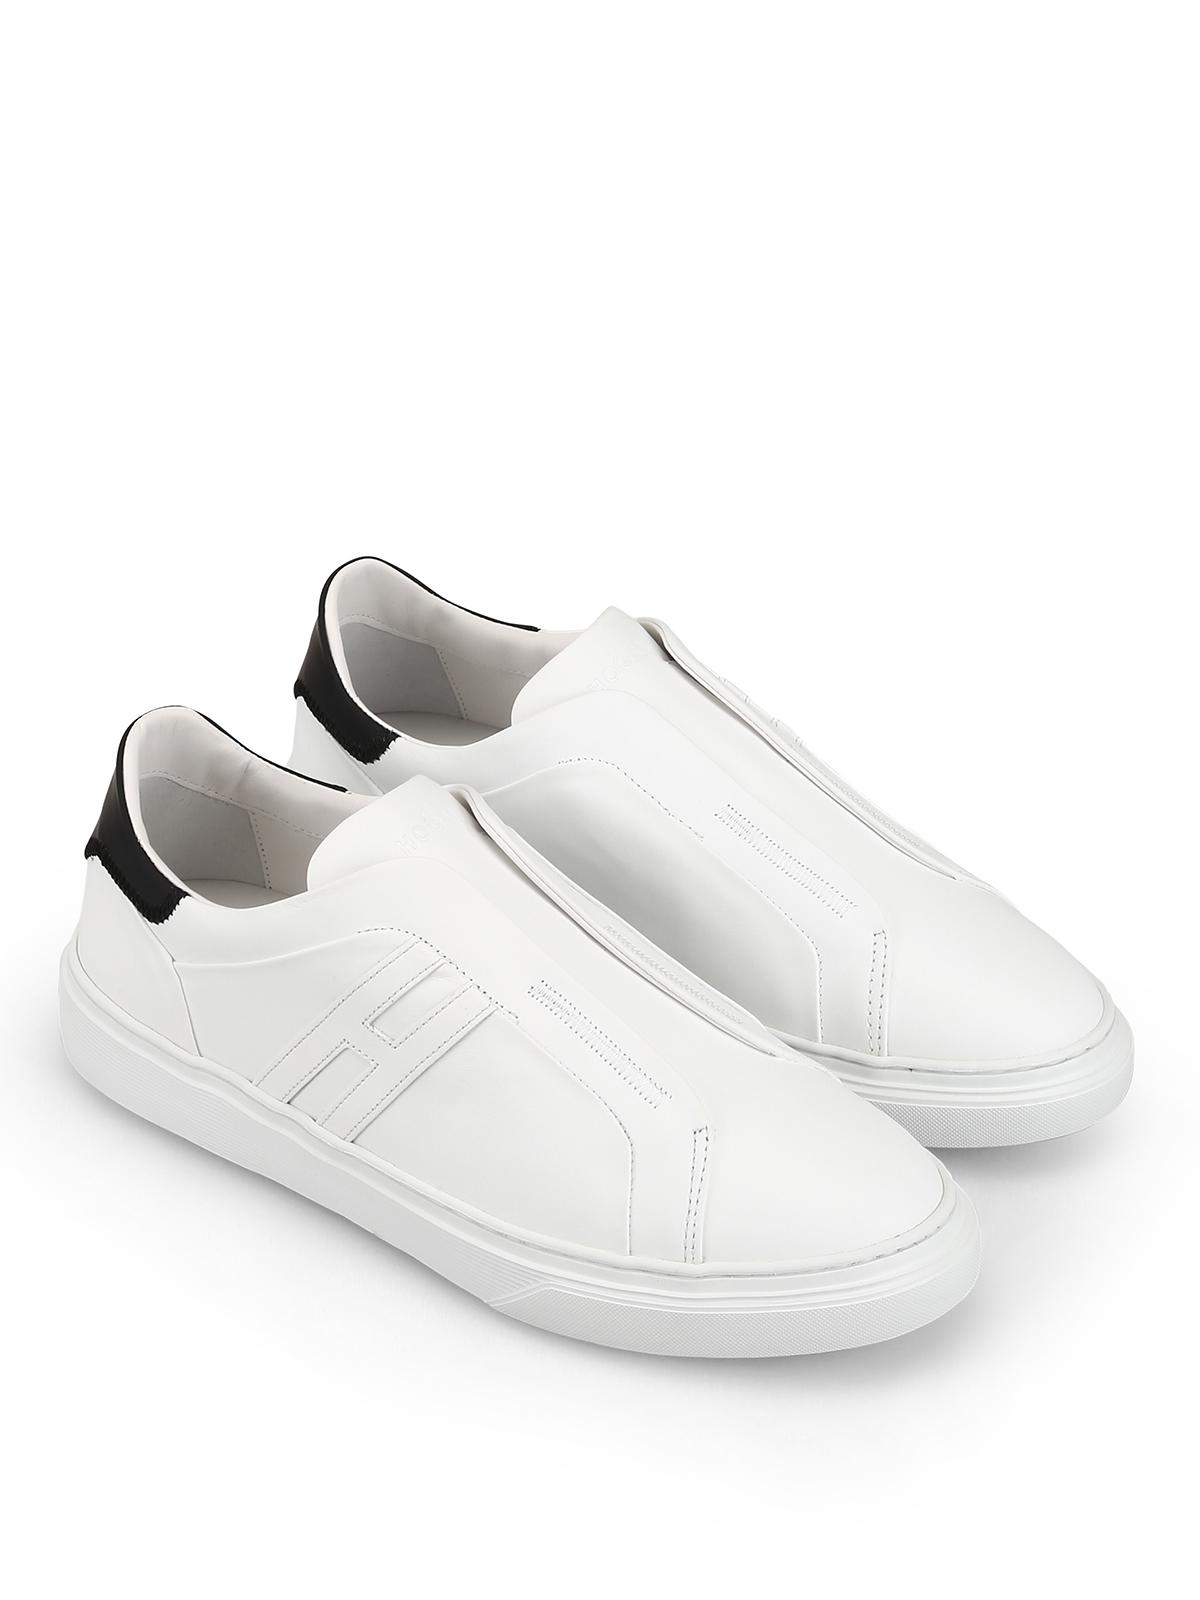 Sneakers Hogan - Slip-on H365 bianche in pelle - HXM3650BE00KFM0001